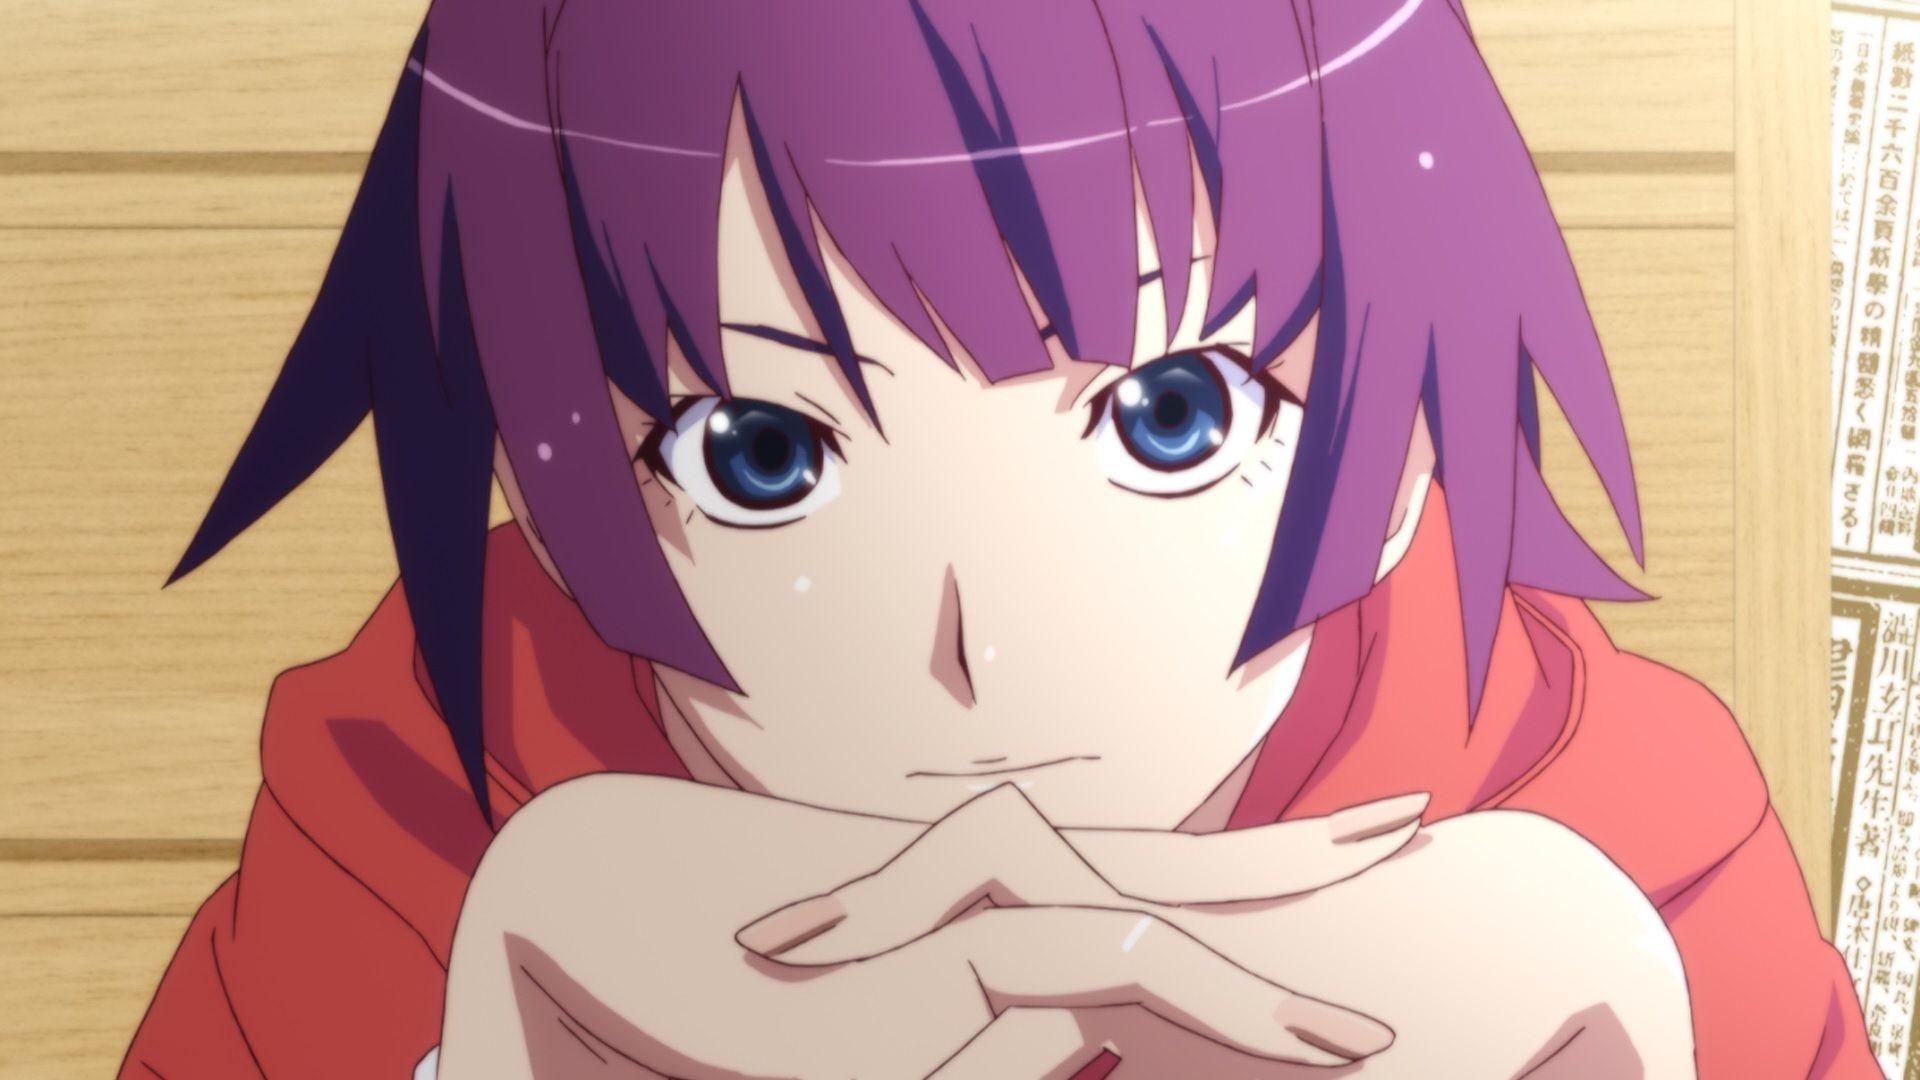 Hitagi Senjougahara Latest anime, Vinland saga, Anime